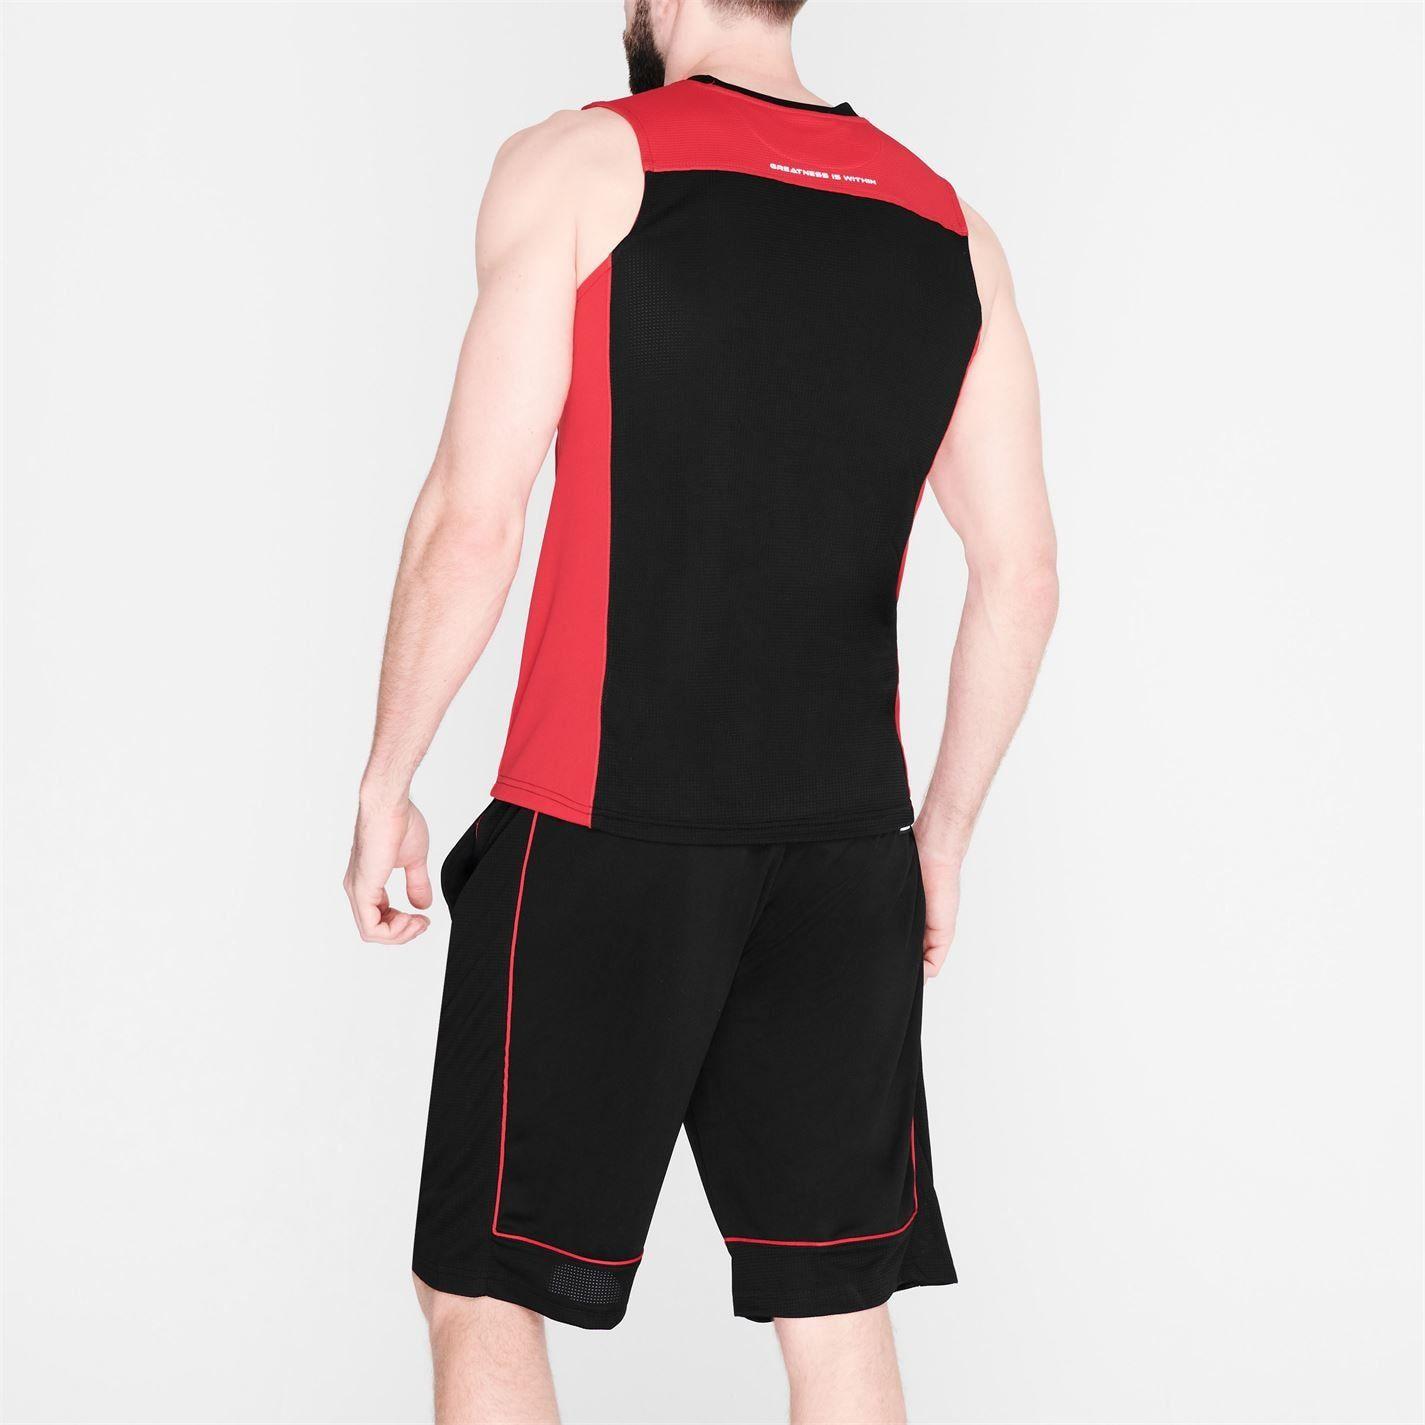 Everlast Mens Basketball Jersey V Neck Sleeveless Sports Training Athletic Top